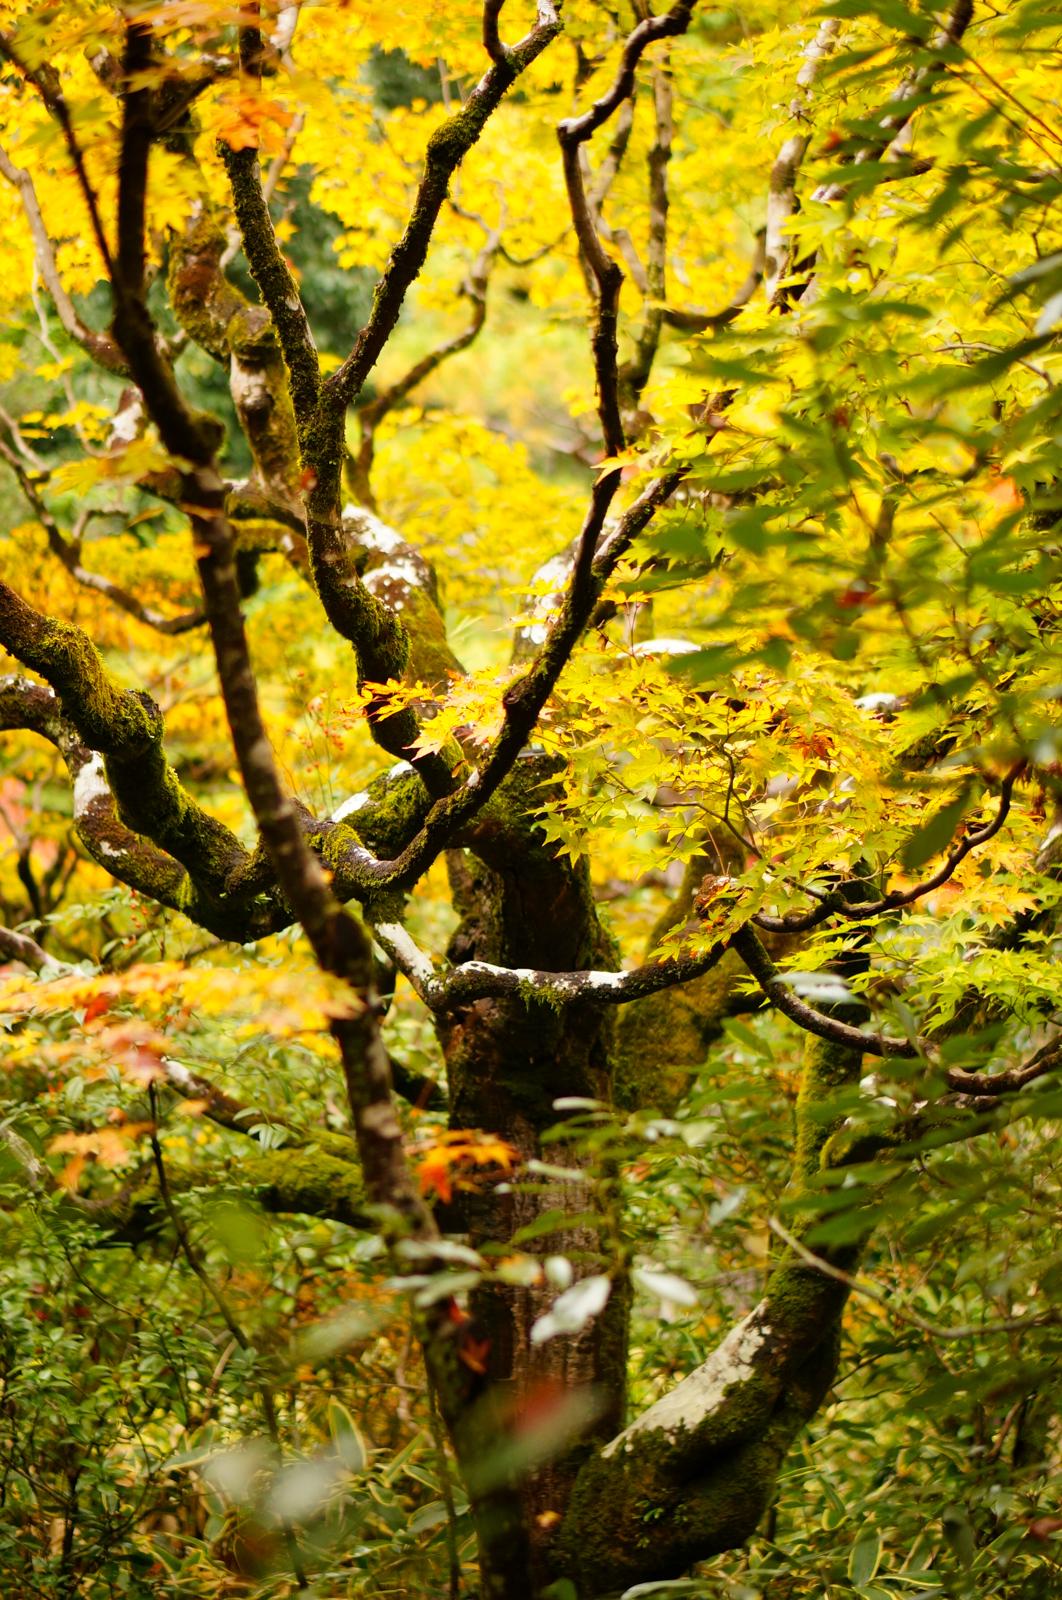 Kyoto, momiji kyoto, voyage kyoto, séjour kyoto, kyoto automne, kyoto fall, kyoto autumn, kyoto érables